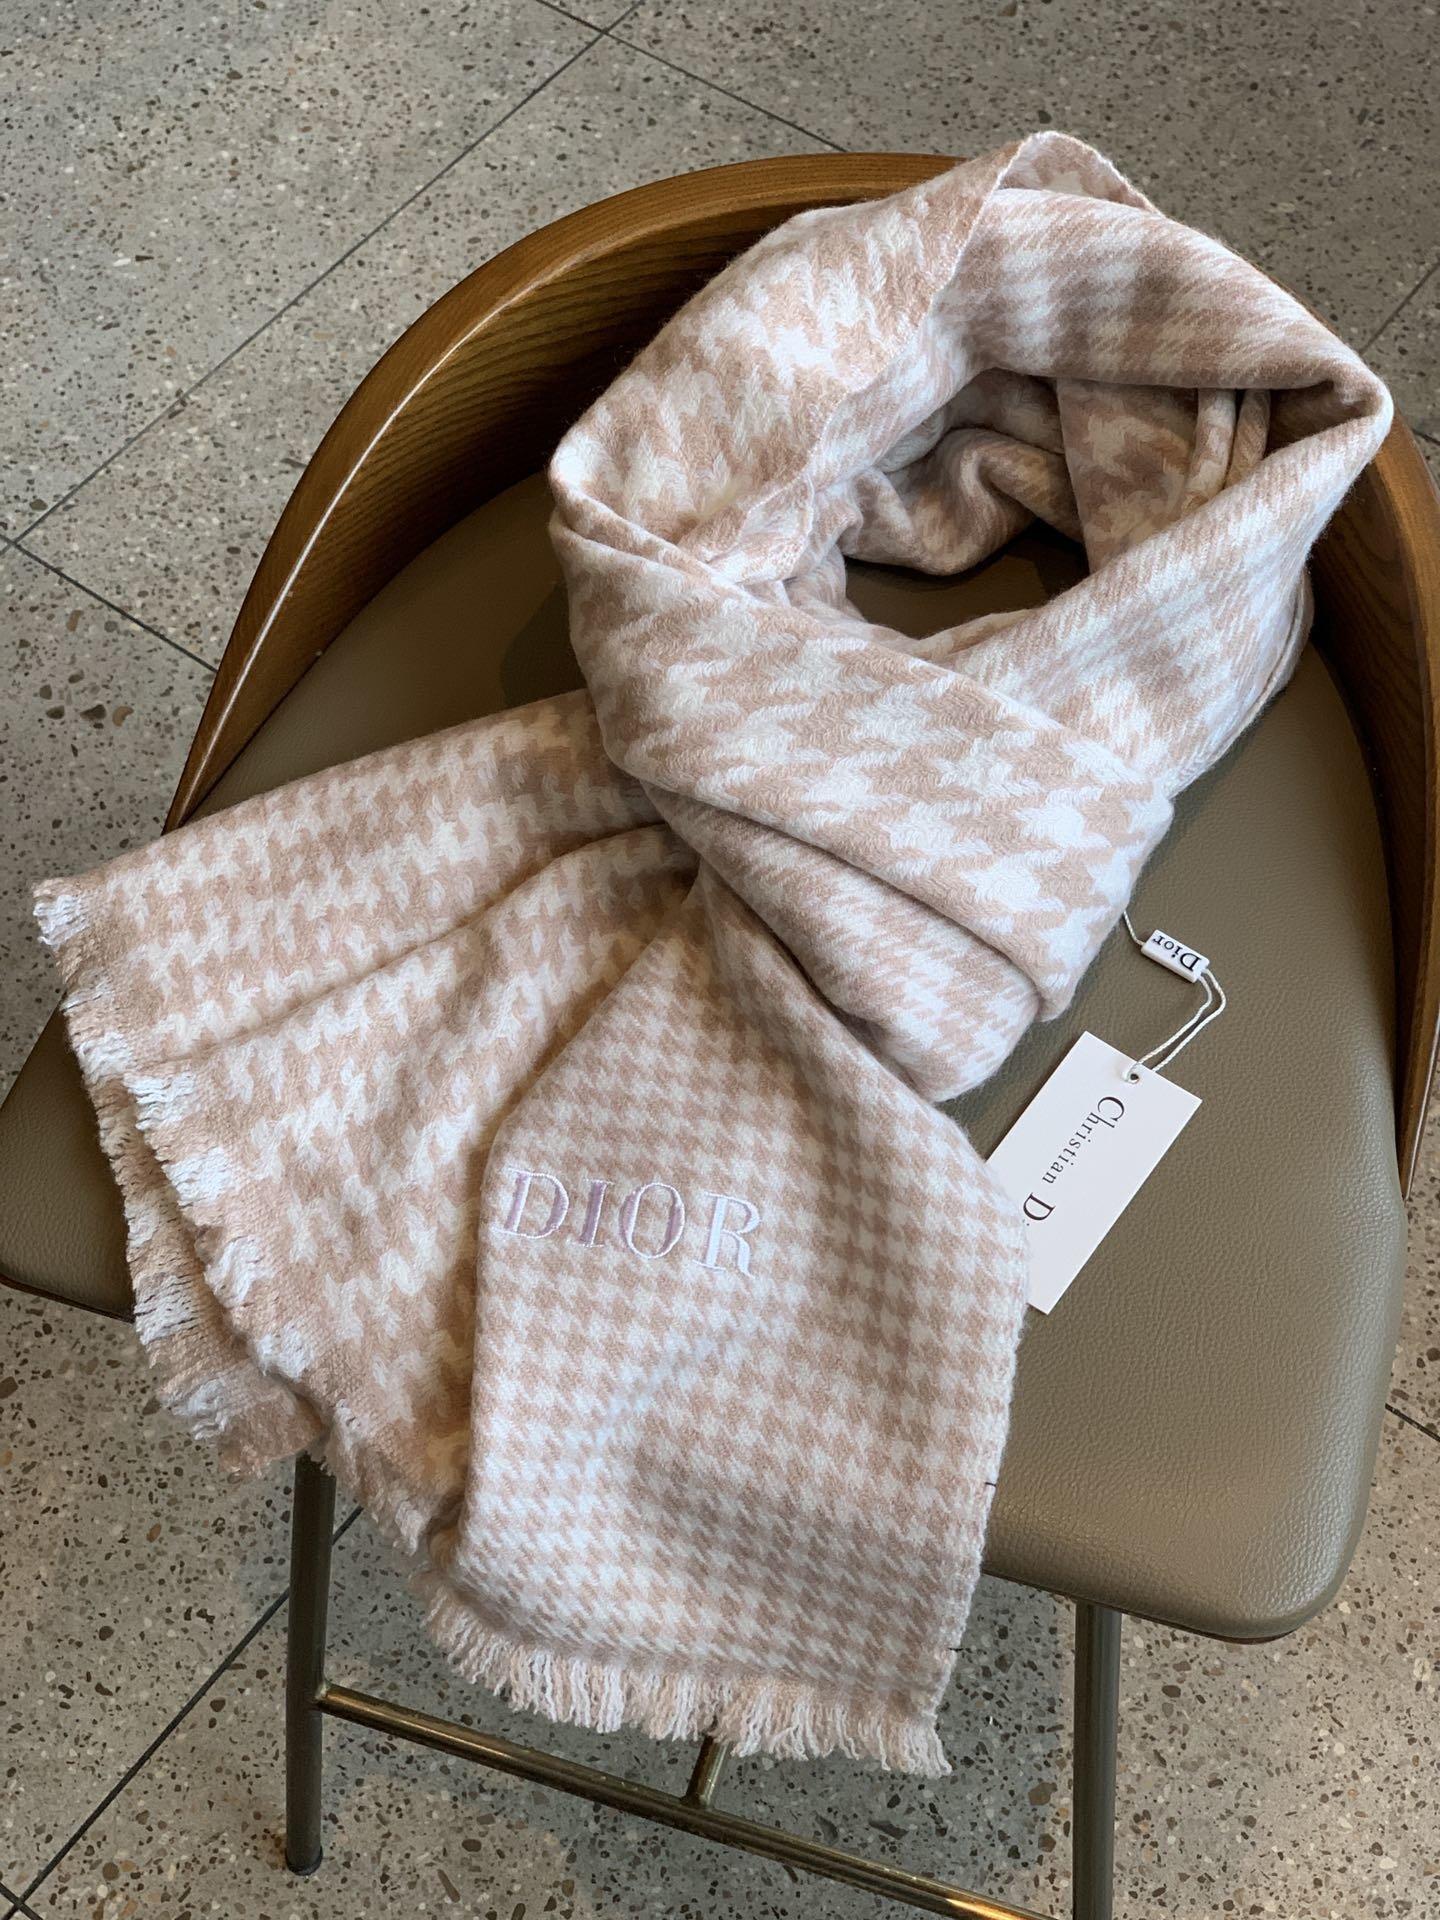 时髦气质Dior羊绒千鸟格秋冬必备的